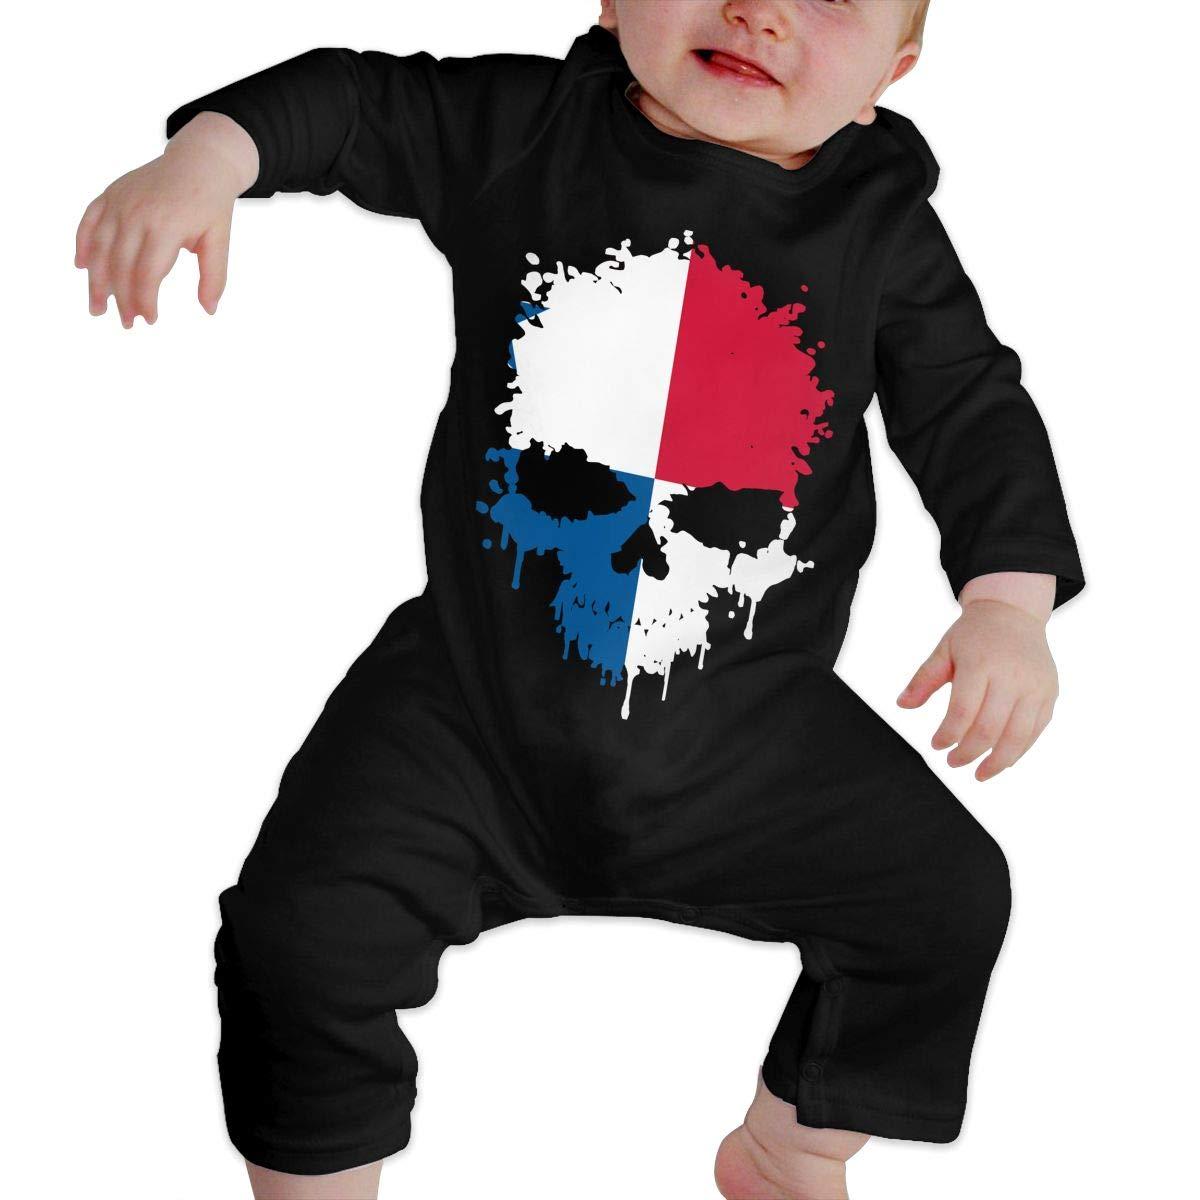 U99oi-9 Long Sleeve Cotton Rompers for Baby Girls Boys Cute Panama Skull Sleepwear